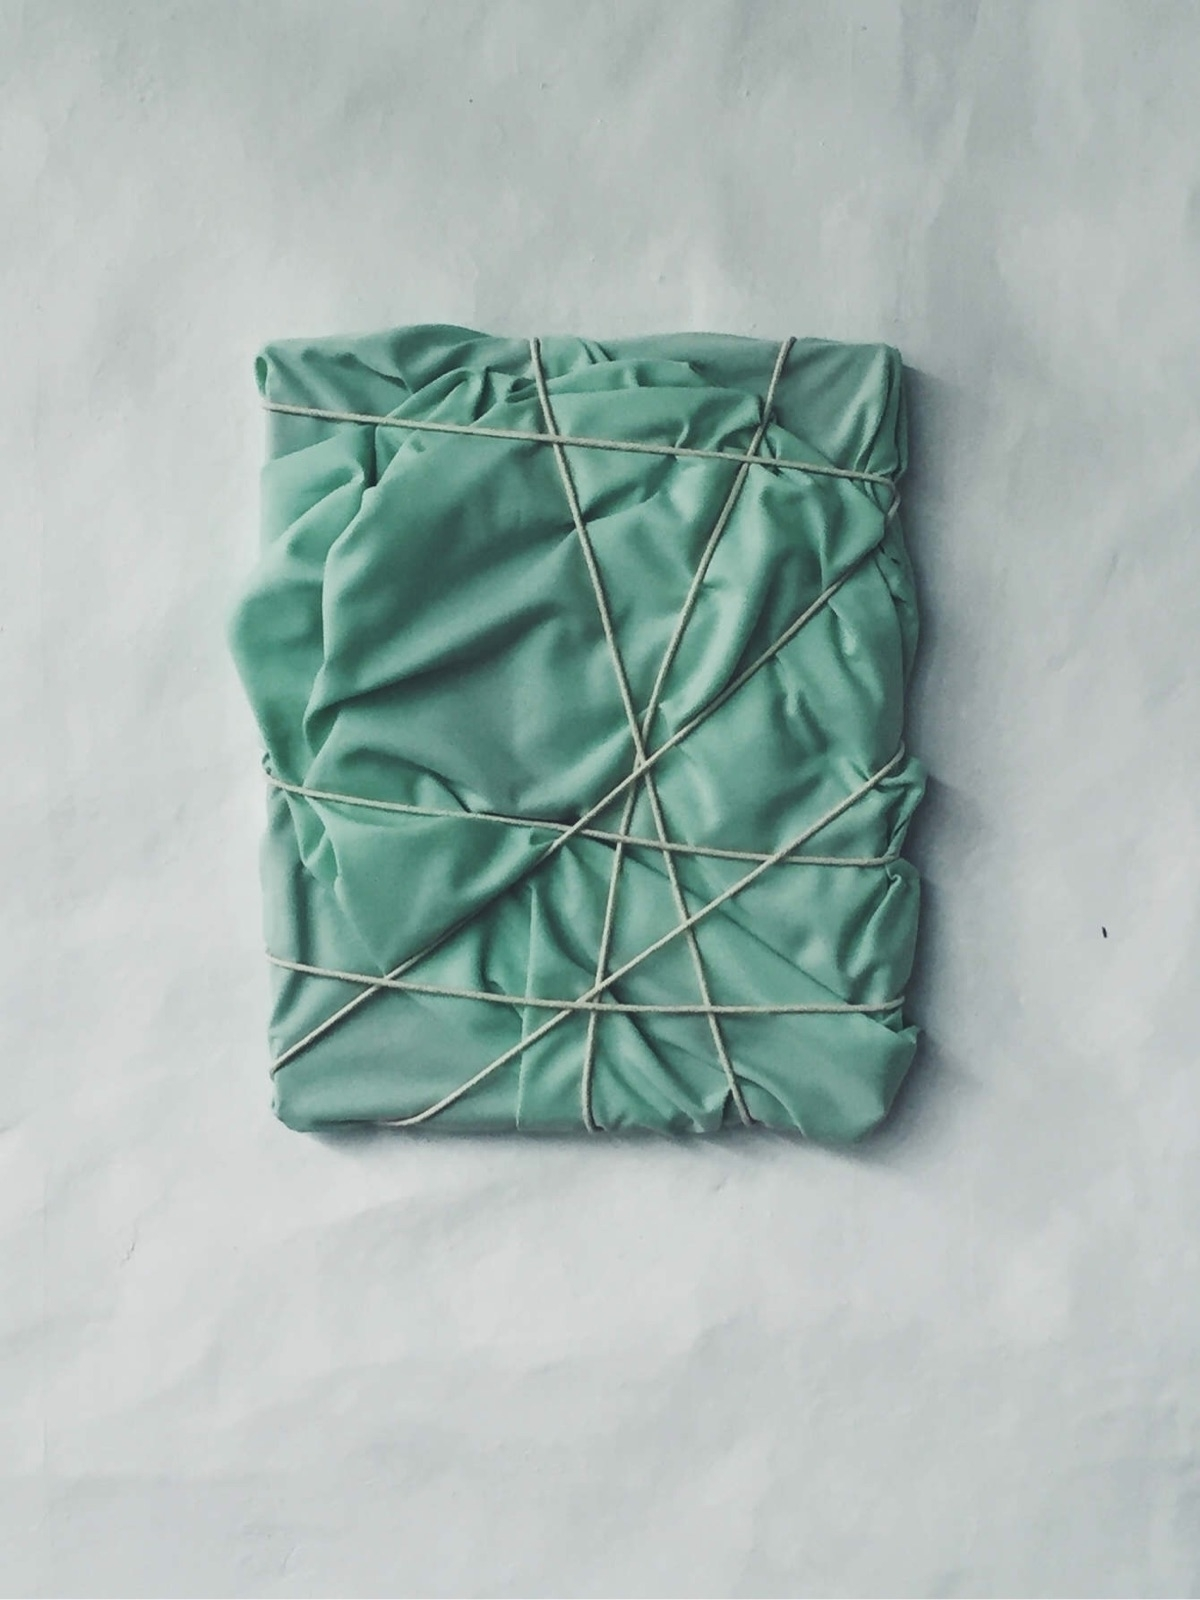 Uncover, 2016 - art, contemporaryart - sebastianvdp | ello